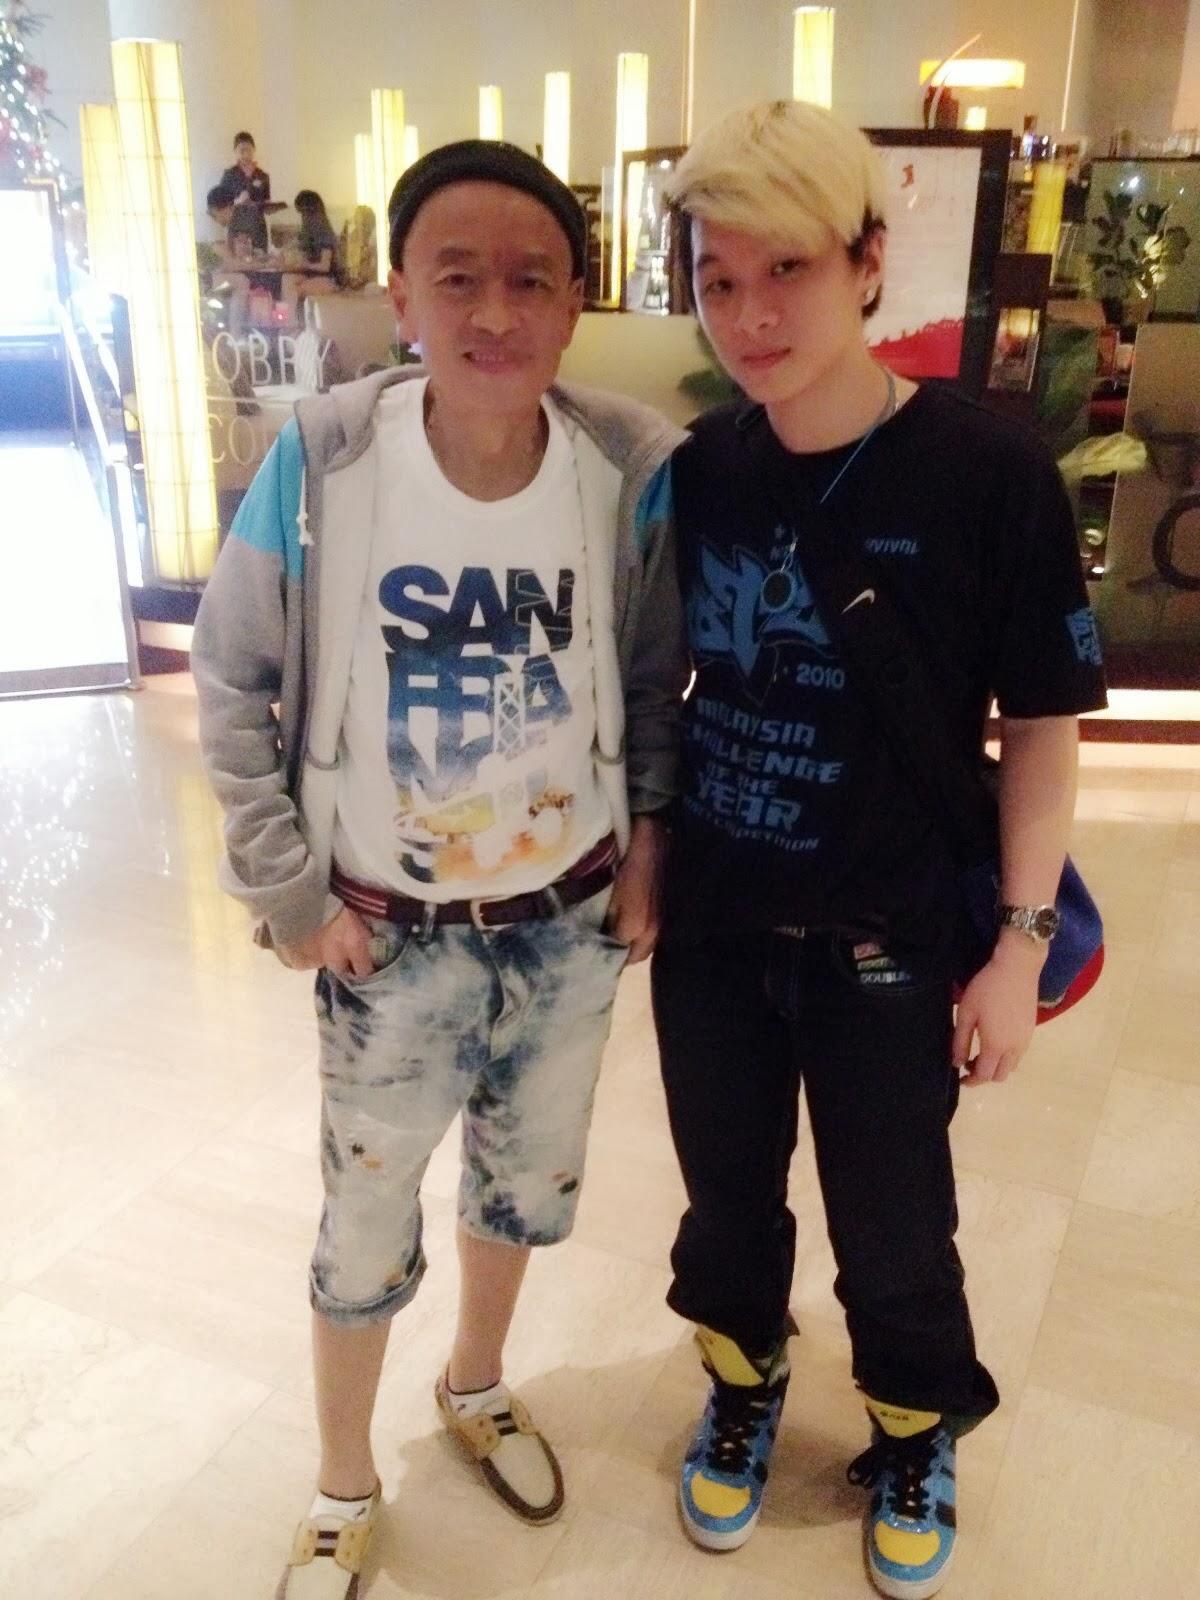 Ray 陳學沿 (raytansy) & 高凌風 Frankie Gao